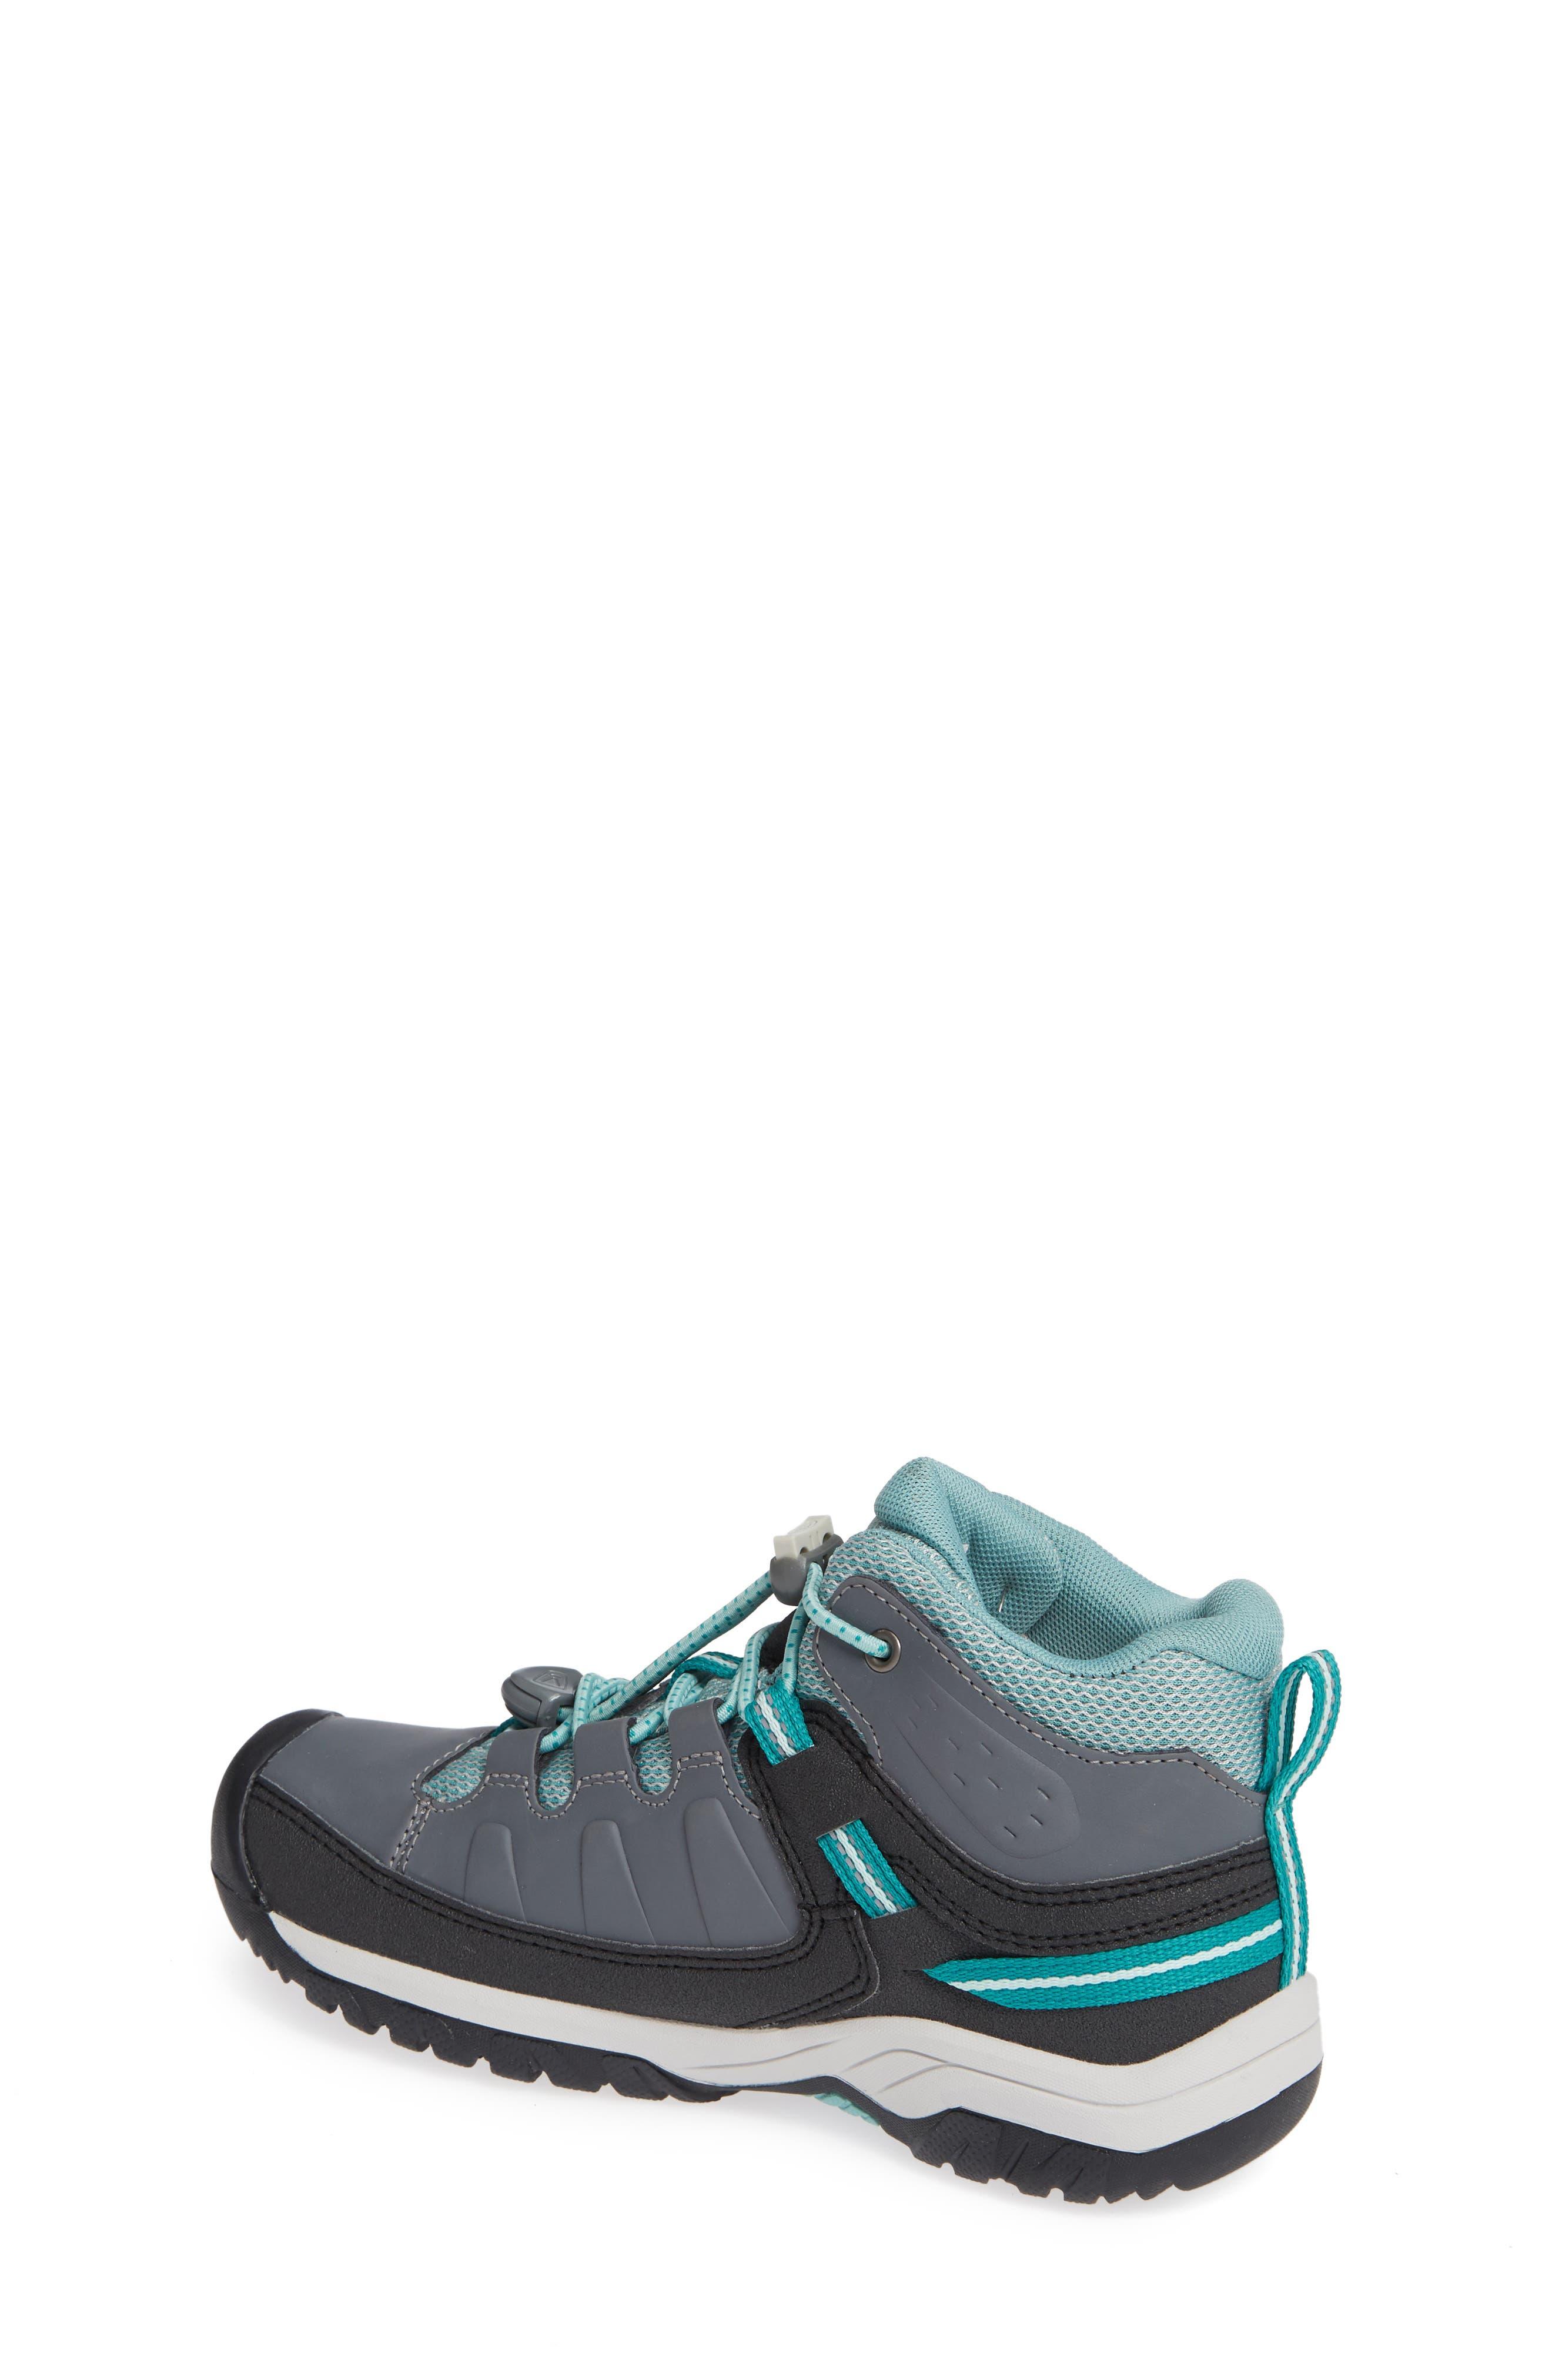 Targhee Mid Waterproof Hiking Boot,                             Alternate thumbnail 2, color,                             GREY/ WASABI